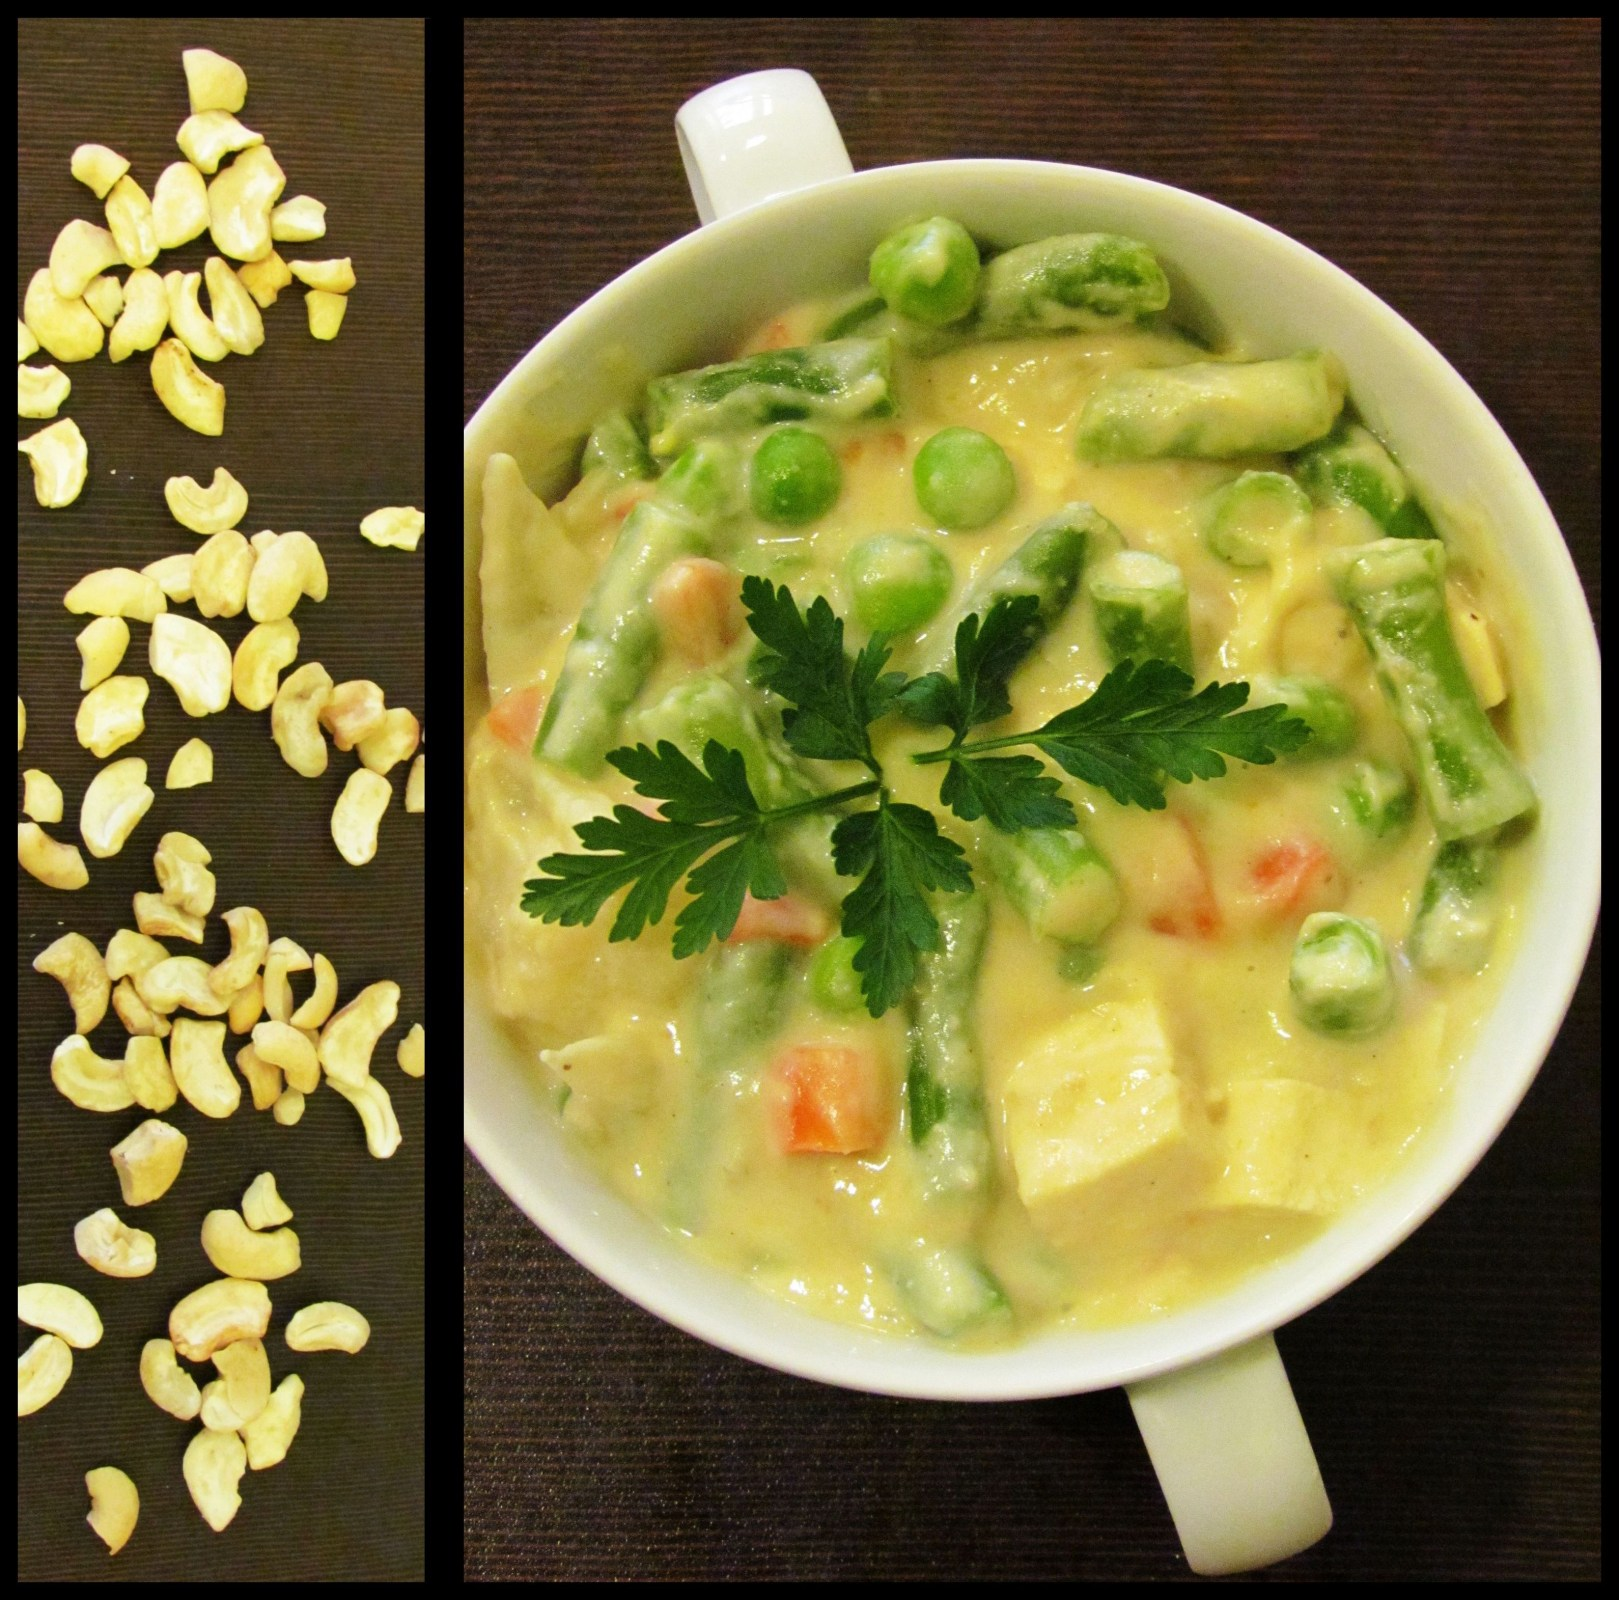 Cashew dish, photo: courtesy of Govinda Pure Veg. & Vegan Restaurant